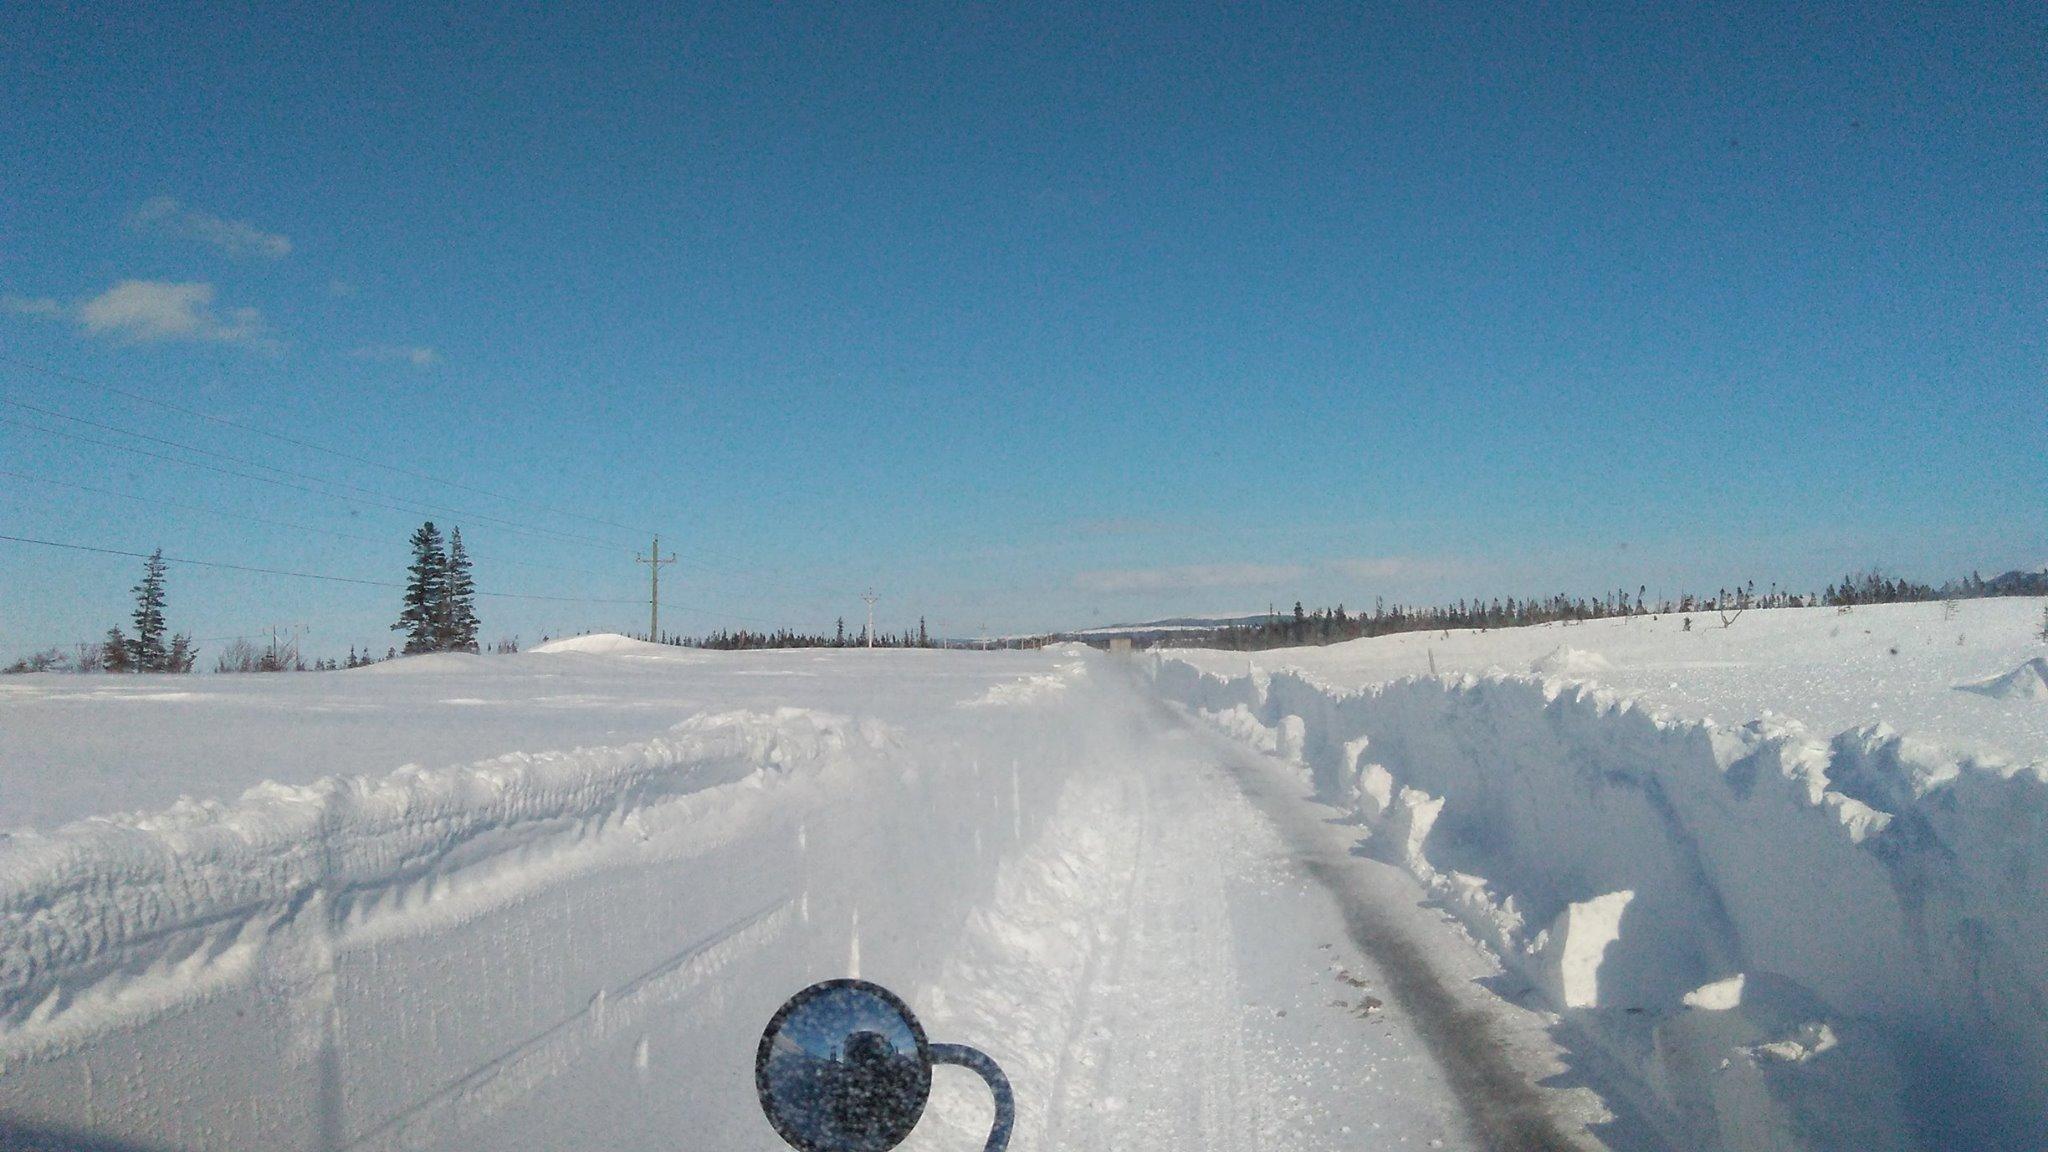 I-think-we-have-enough-snow-Newfoundland--8-4-2019--3